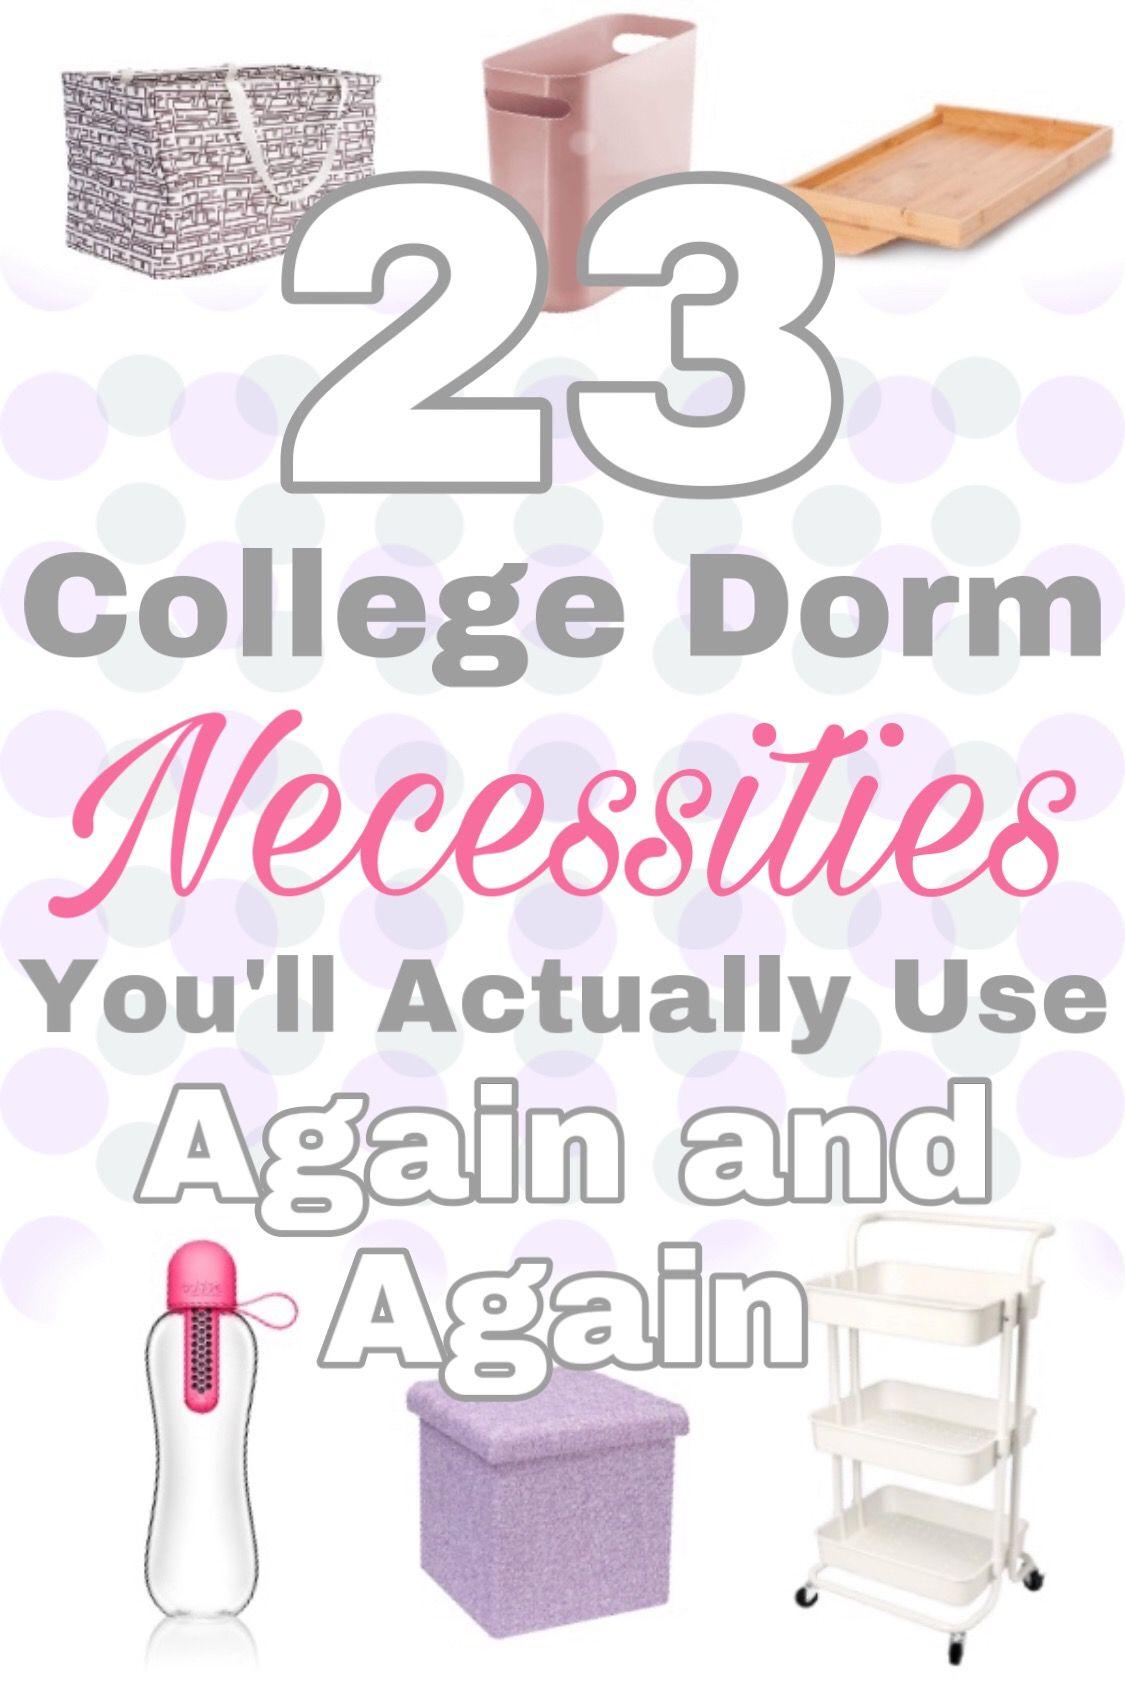 #college #collegedorm #dorm #dormroom #university #collegetips #collegeprep #collegeadvice #collegelife #universitylife